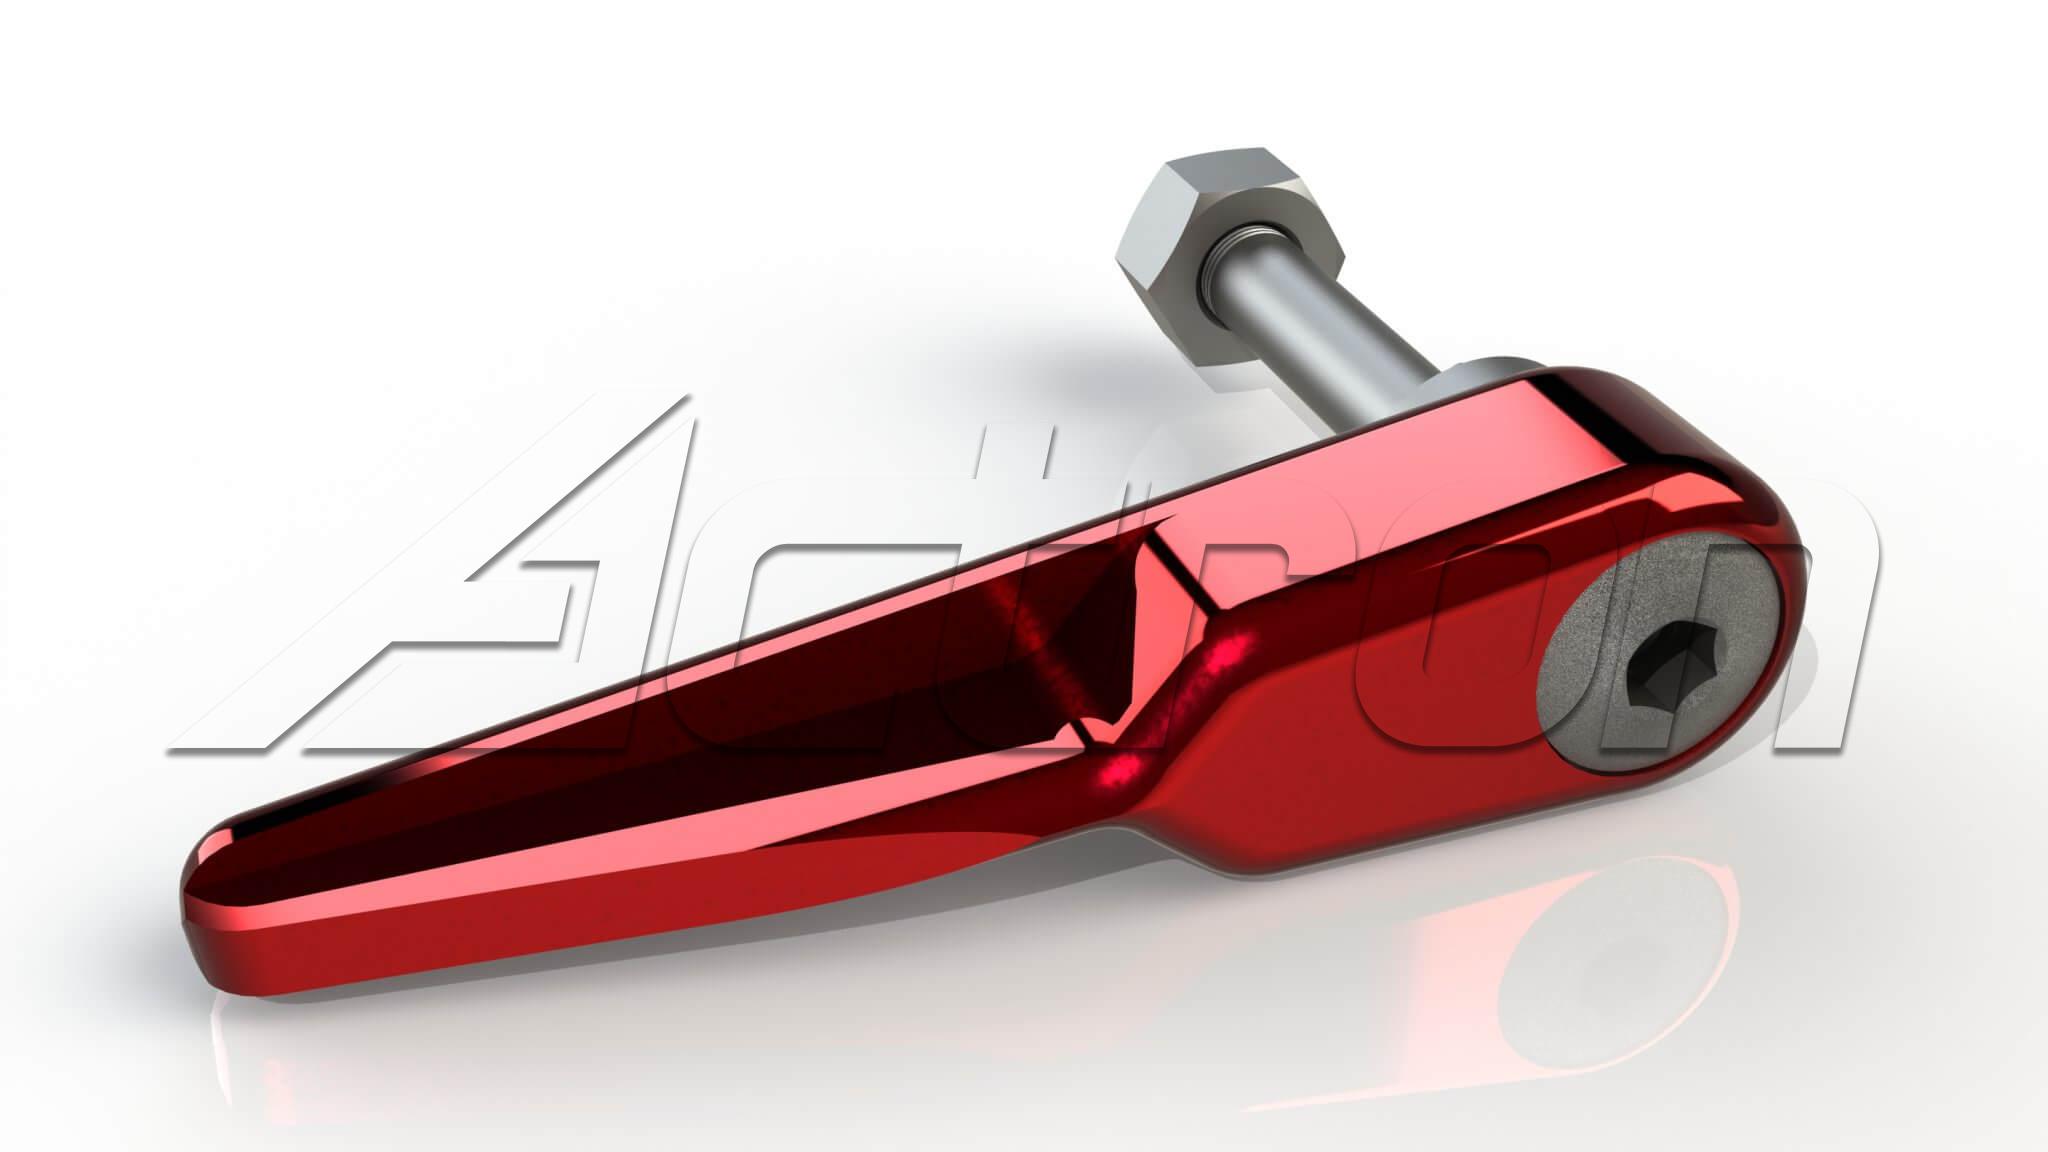 1-4-turn-retainer-4639-a35642.jpg